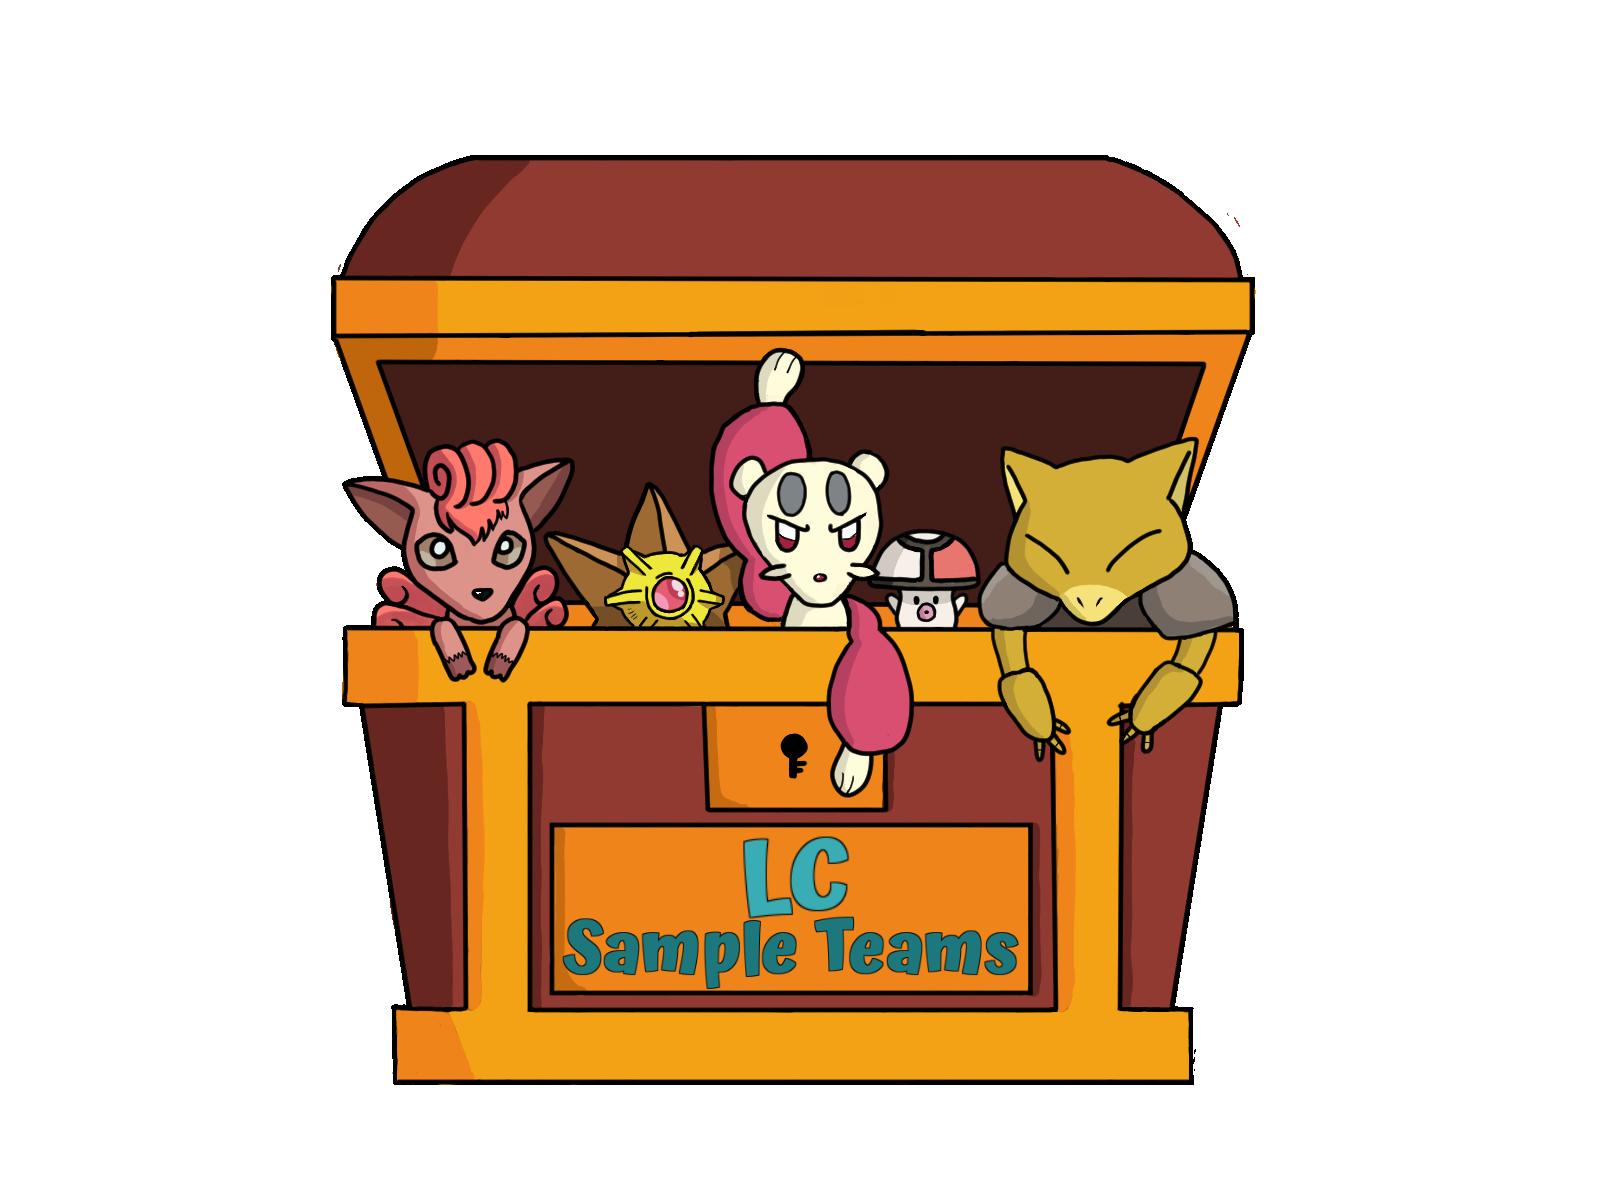 Resource Ss Lc Sample Teams Smogon Forums See more ideas about pokemon, cute pokemon, pokemon art. resource ss lc sample teams smogon